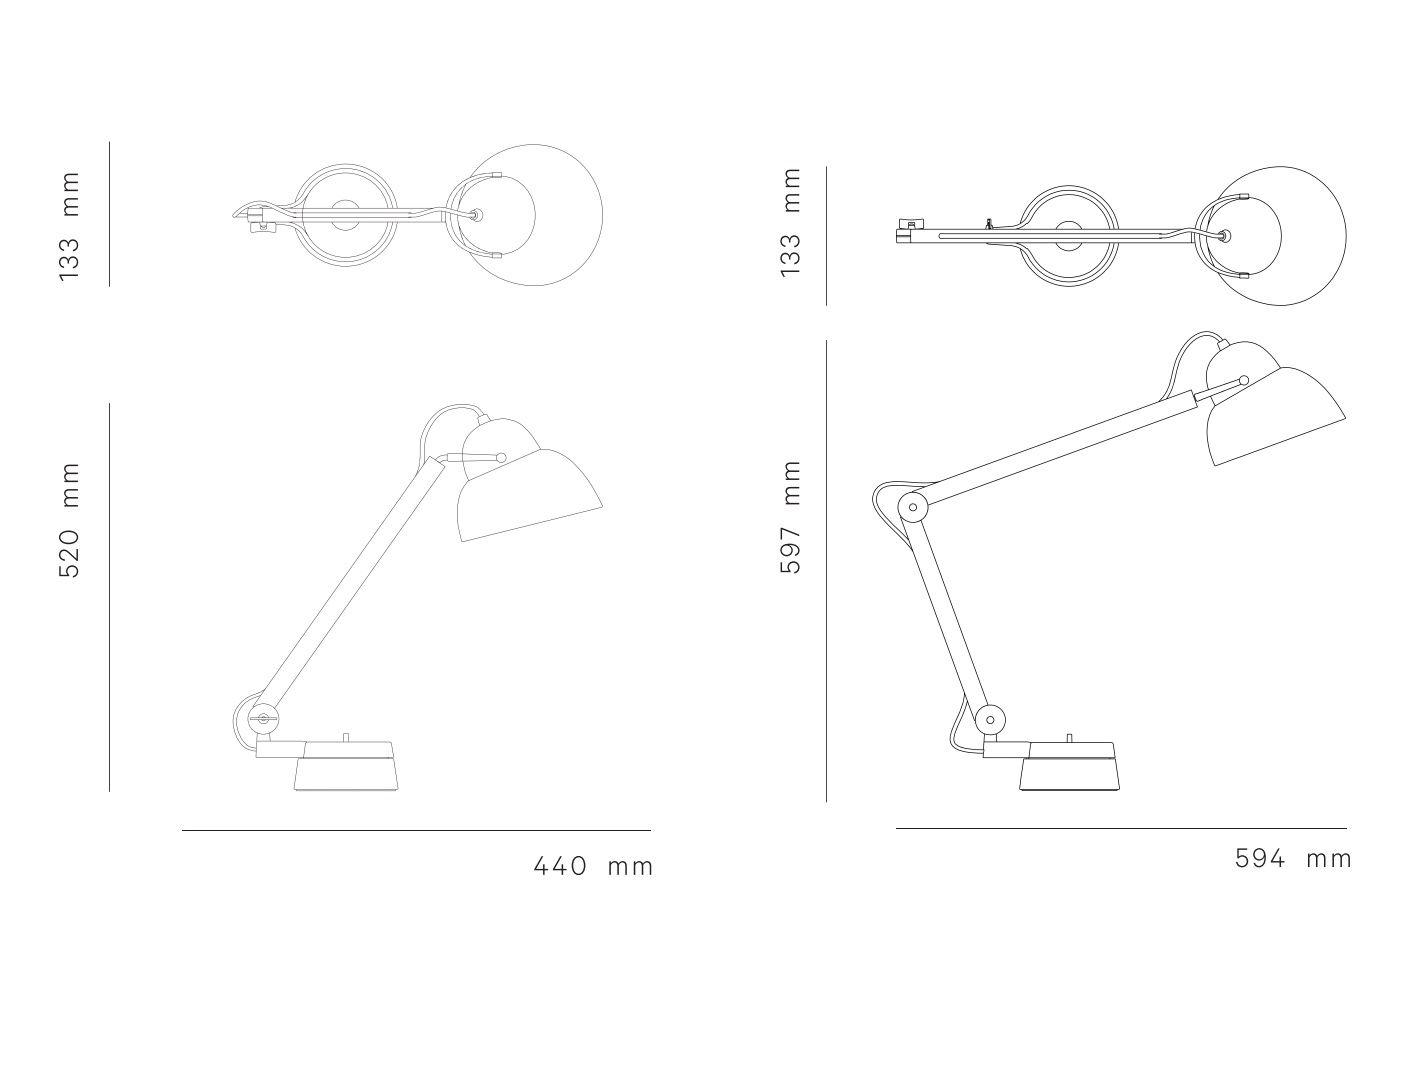 Wästberg Studioilse w084 Table Light-dimension-file